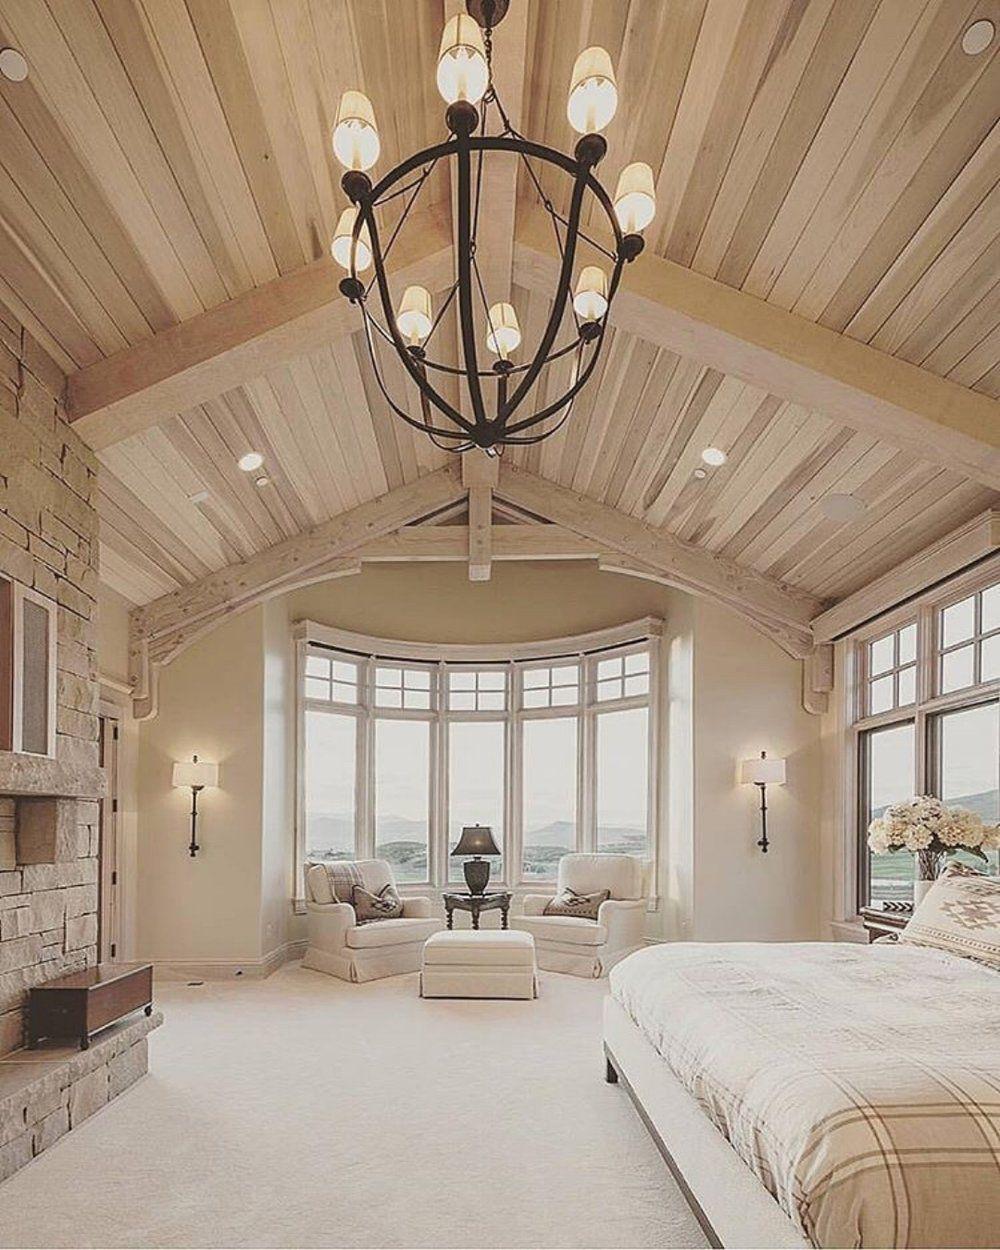 Ultra modern bedroom interior design  gorgeous u ultramodern bedroom designs  interiors bedrooms and